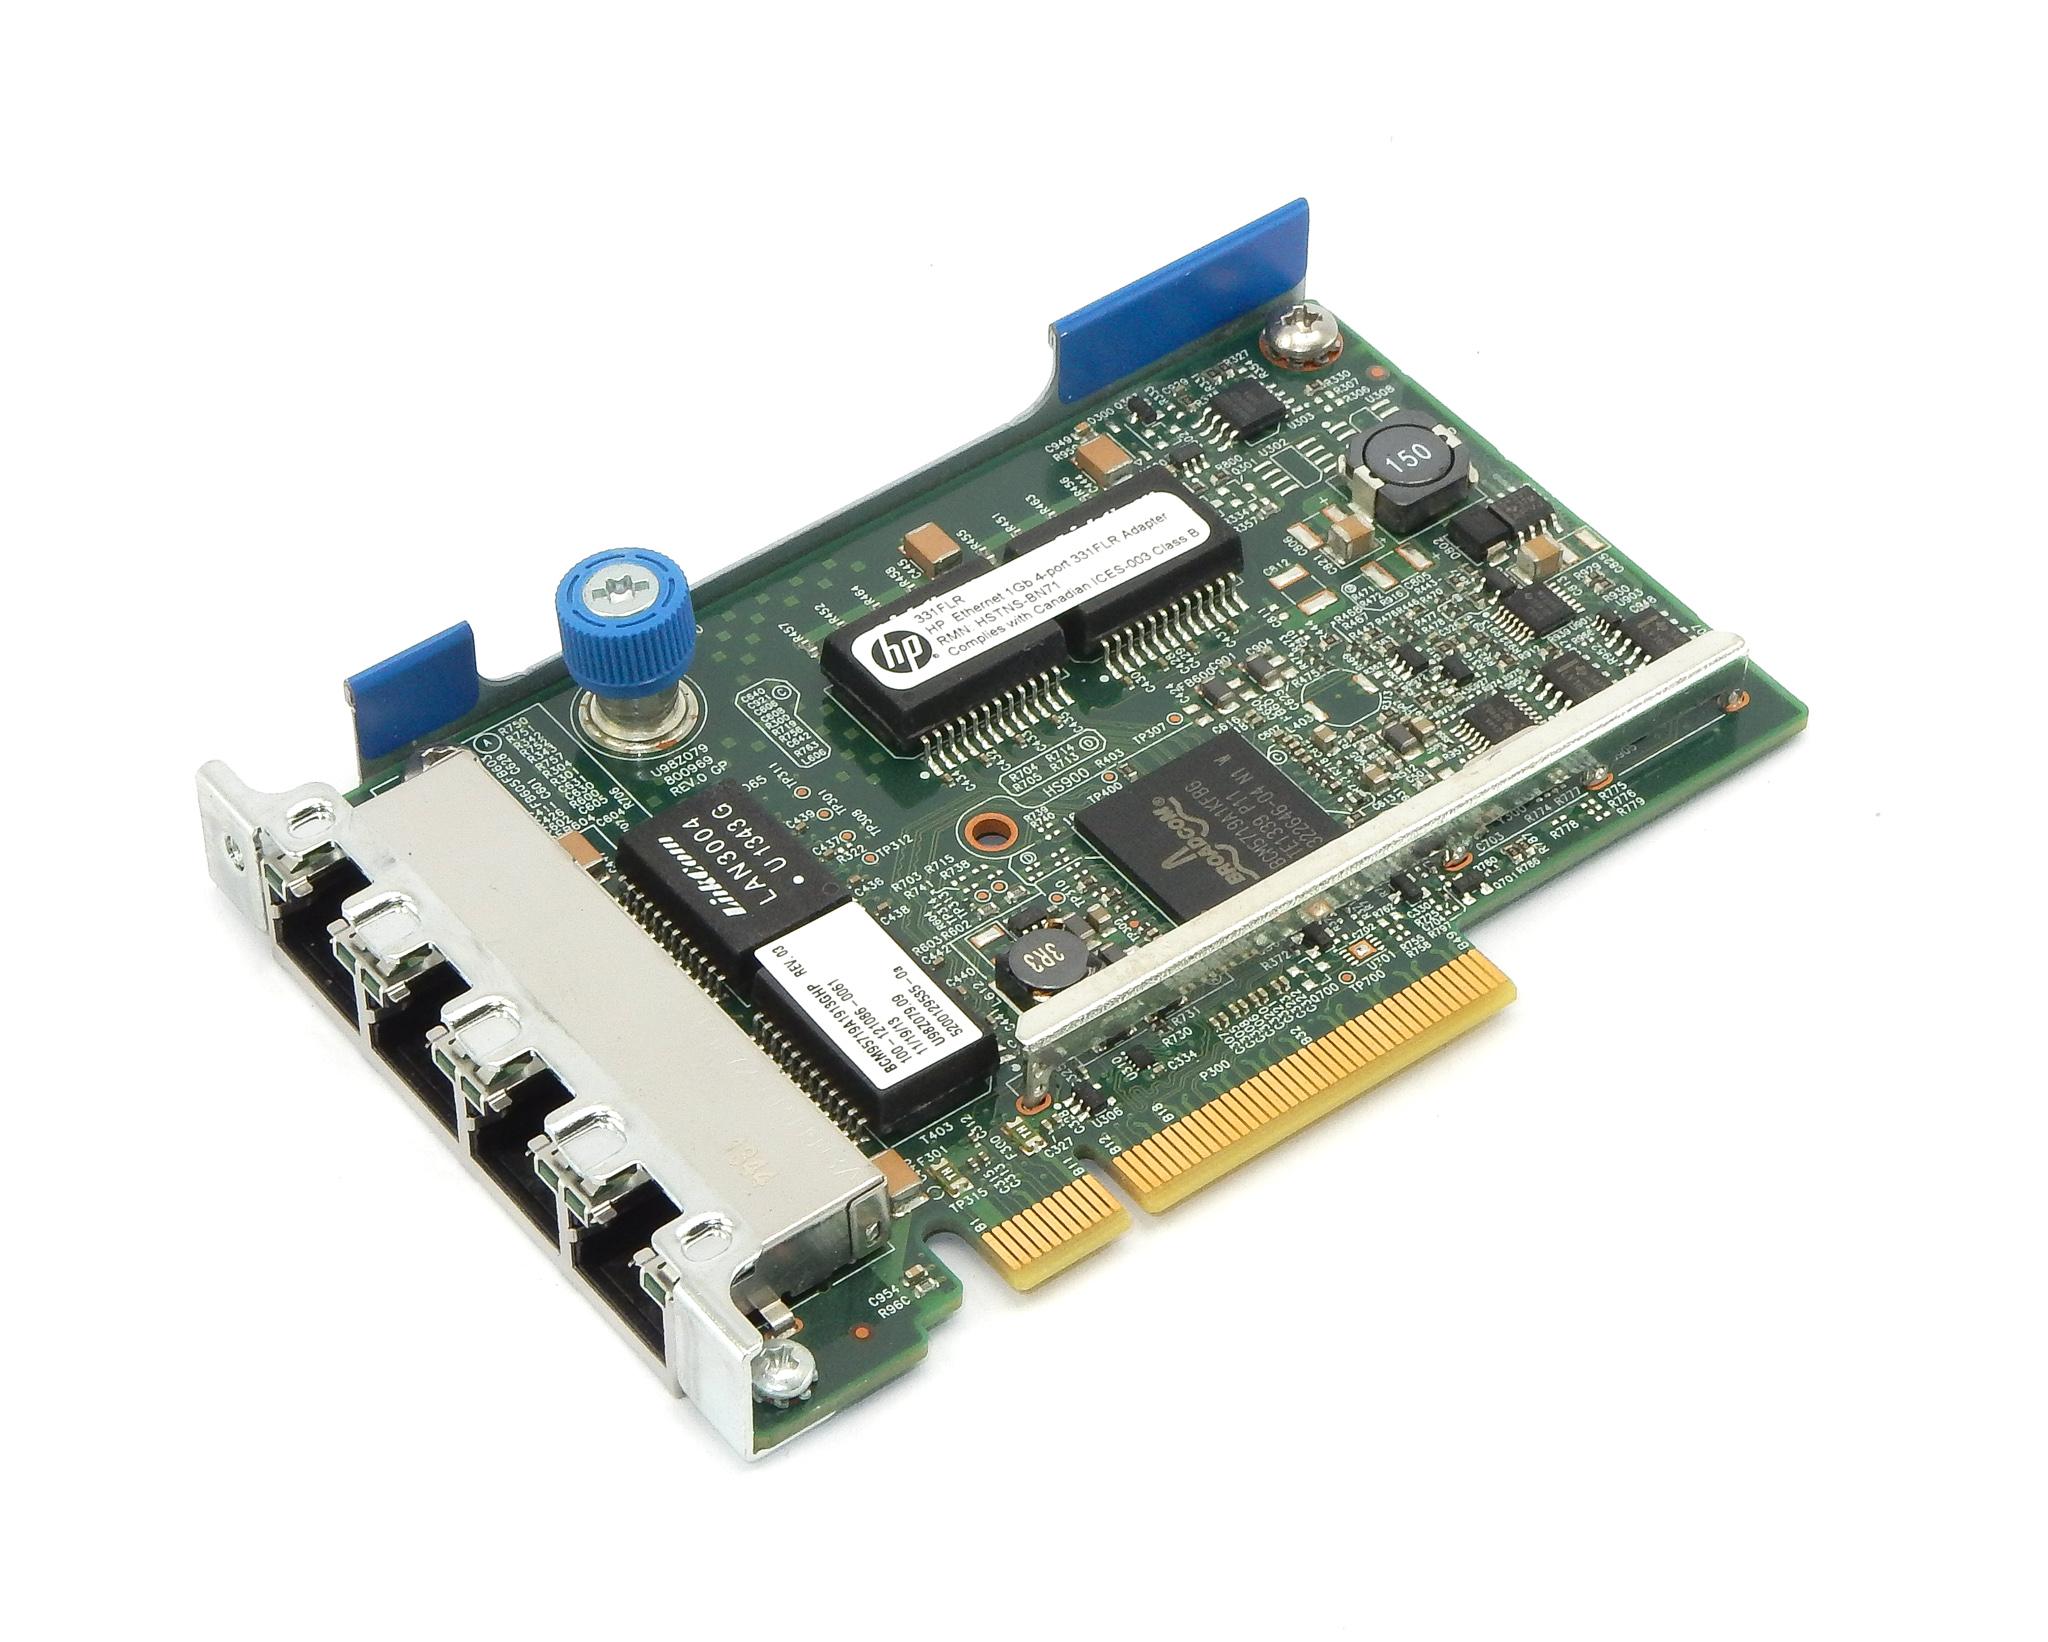 HP 634025-001 4-Port 331FLR PCIe x8 Gigabit Ethernet Adapter- 629133-001